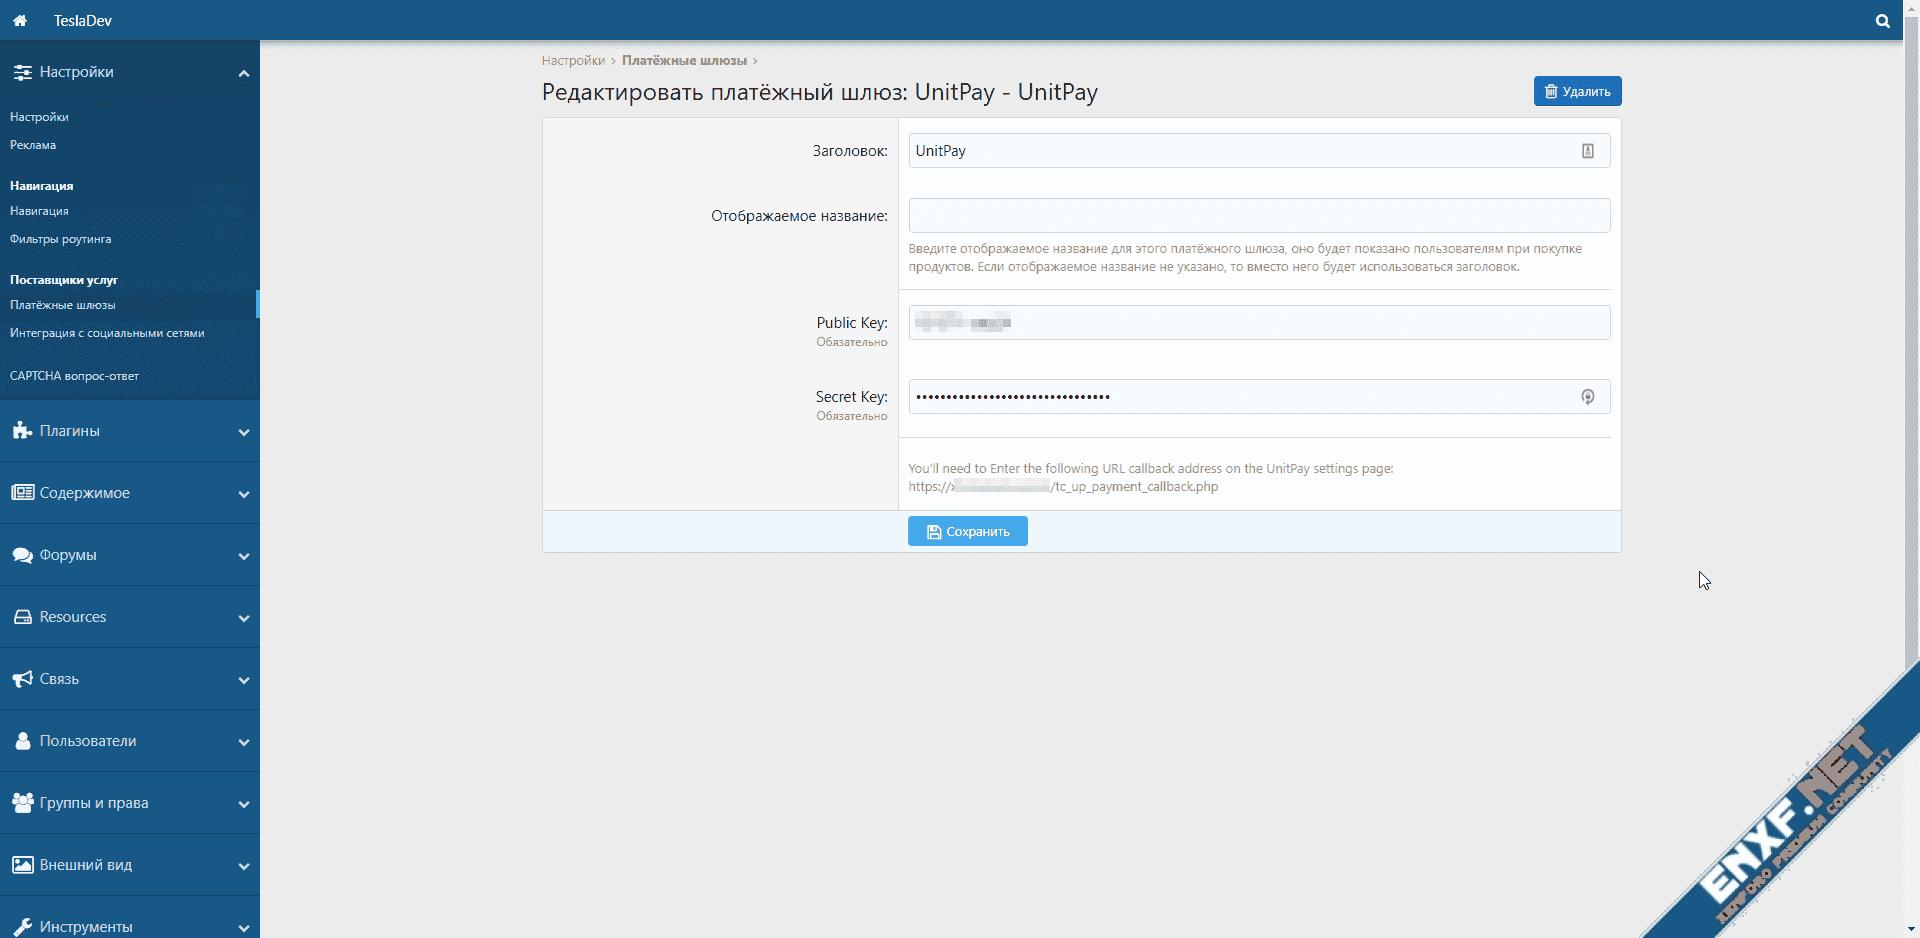 [TC] Paygate: UnitPay